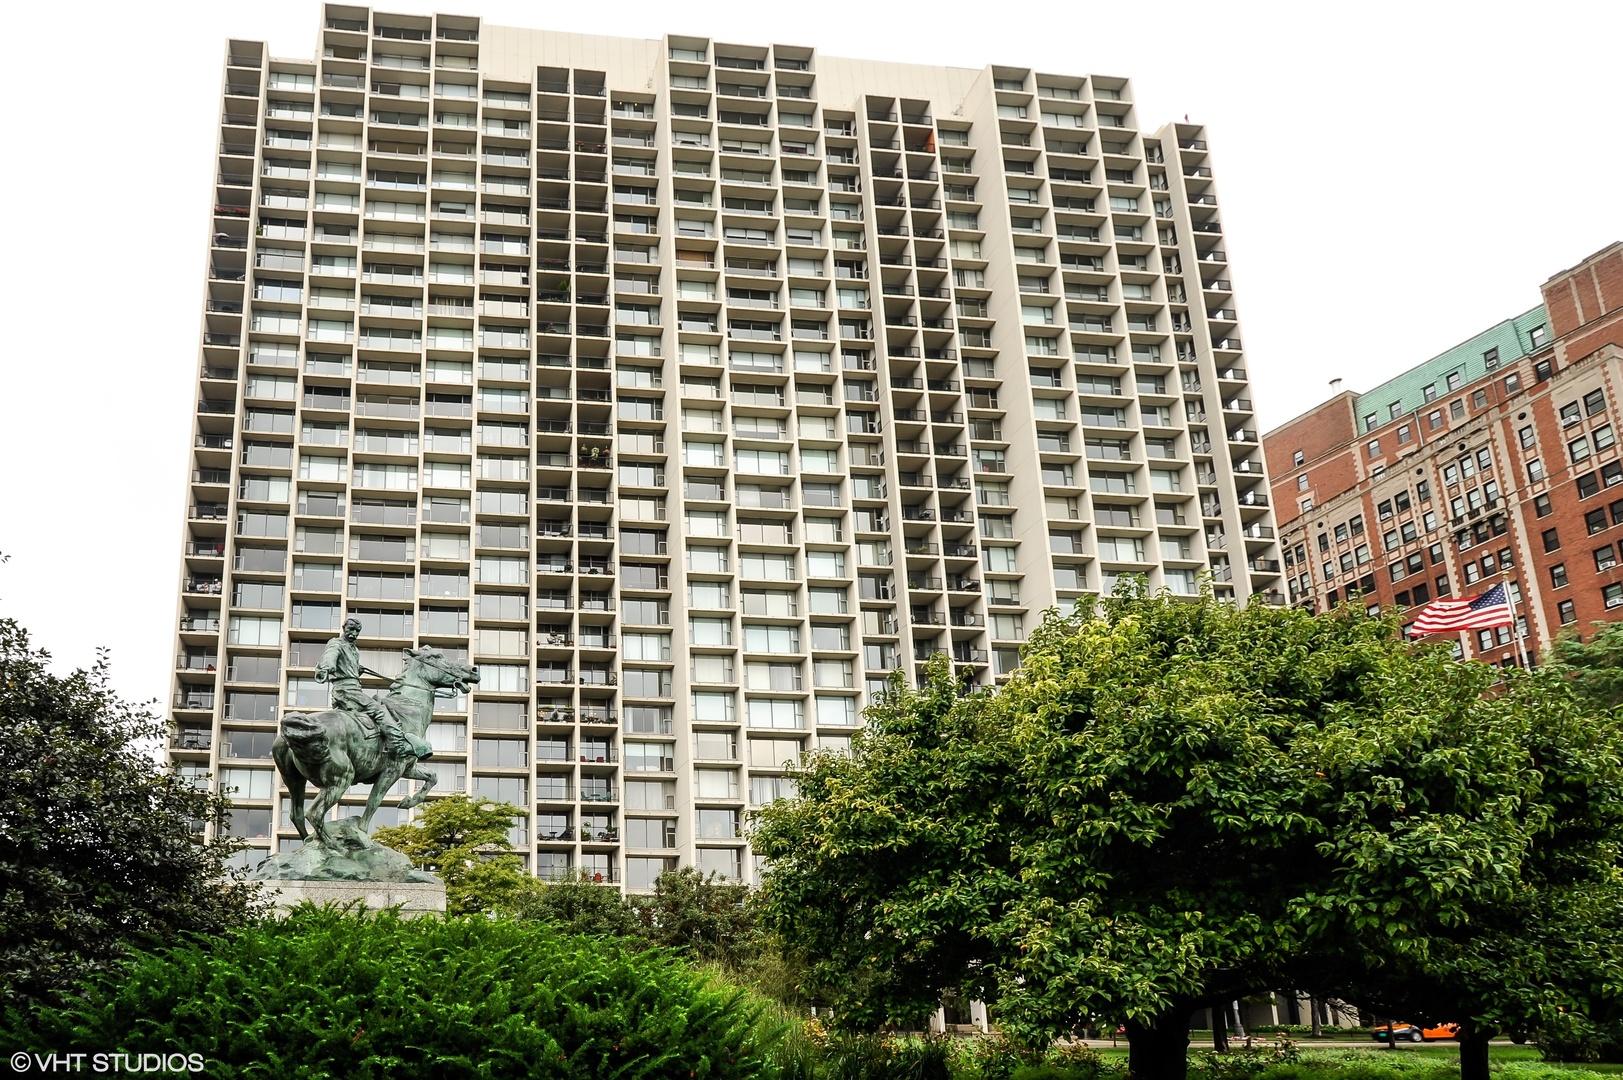 3200 N Lake Shore Drive, Chicago, IL 60657